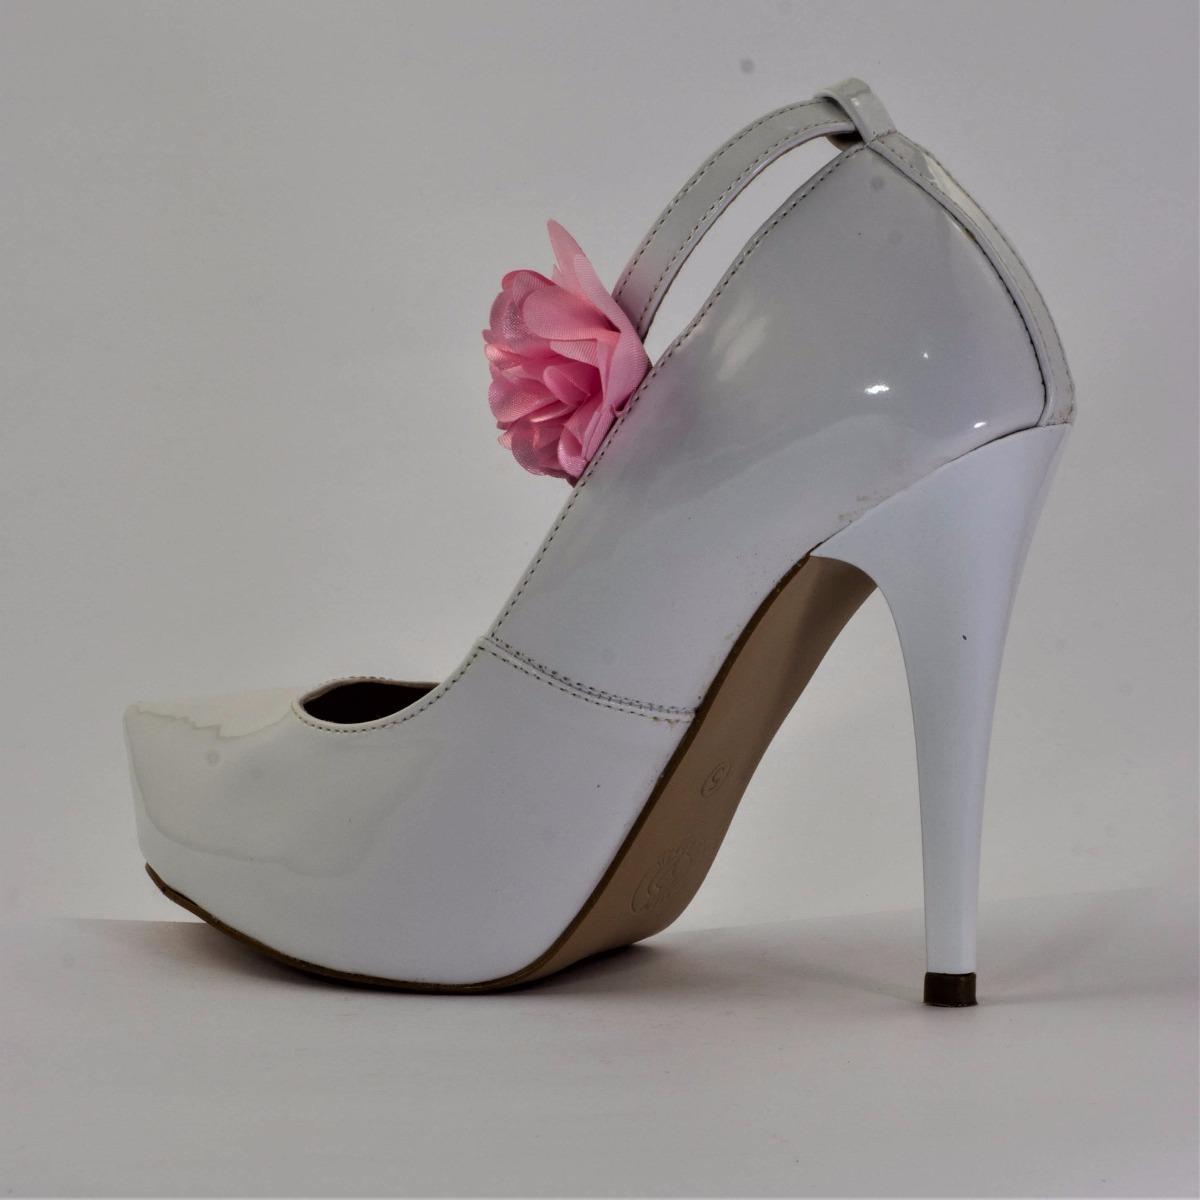 783d95dbf0 sapato scarpin salto 10 cm fino cor verniz branco com tira. Carregando zoom.